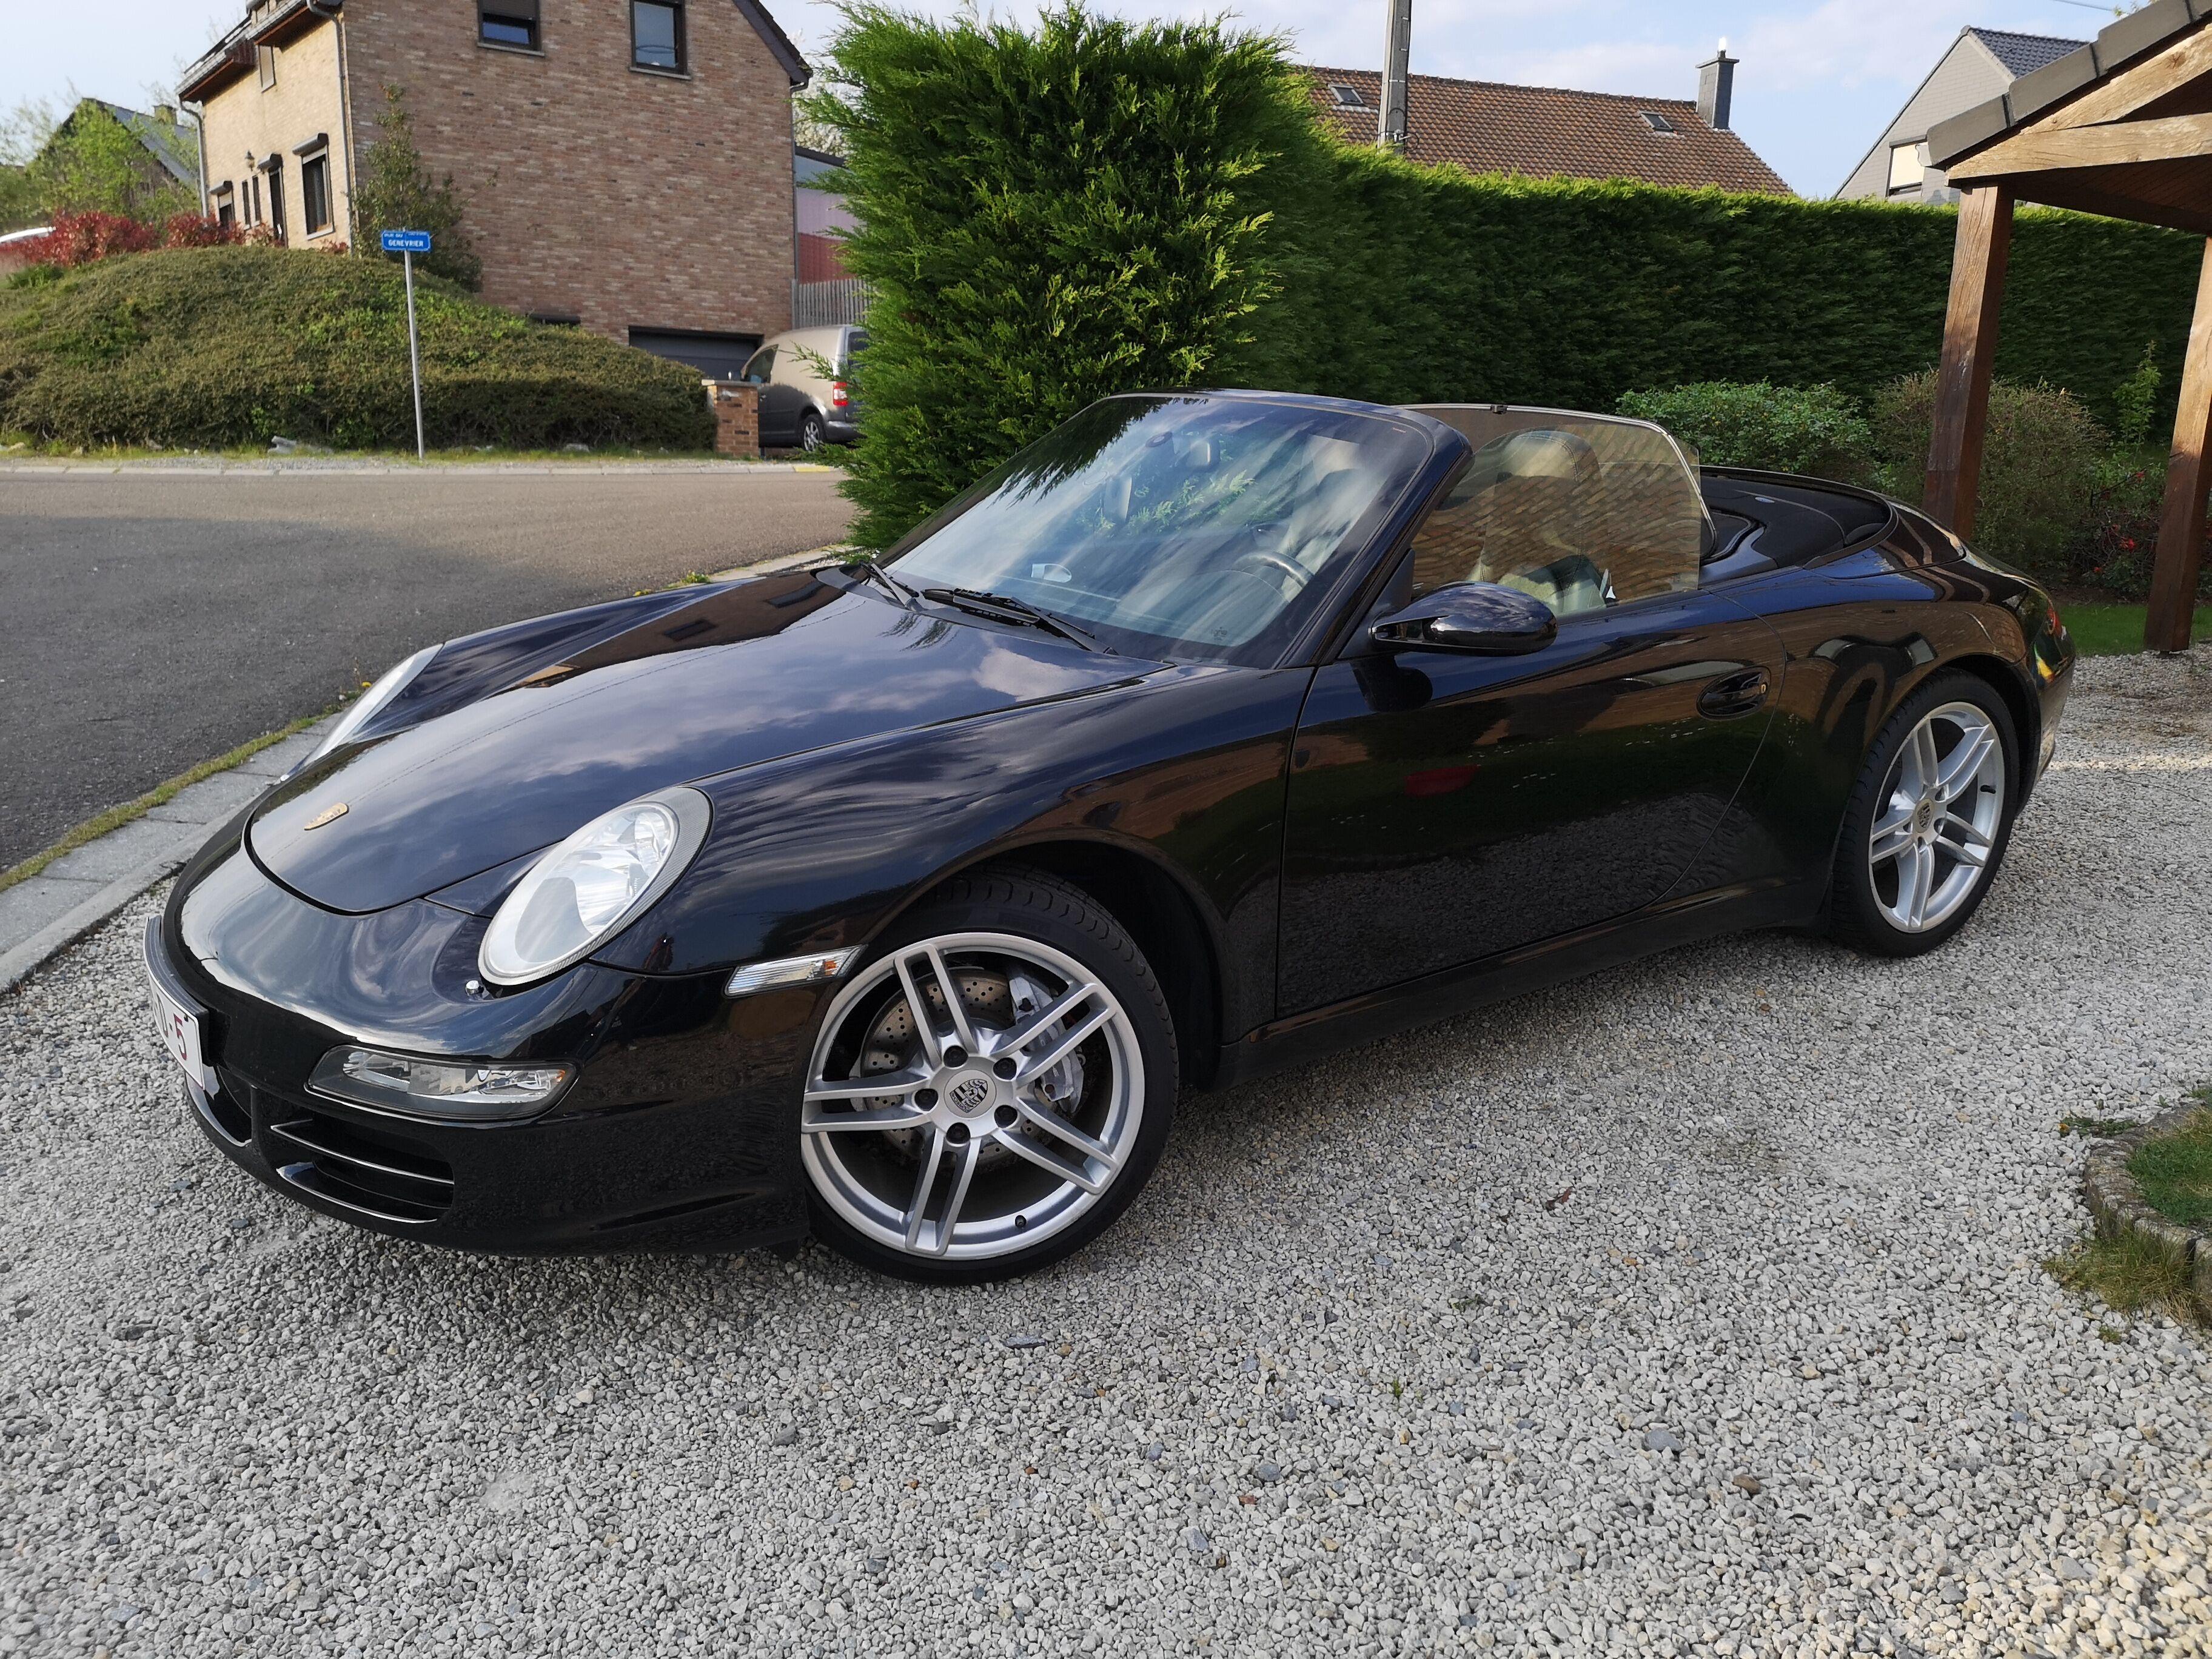 Porsche 911 CARRERA 2 CABRIOLET - 2008 1/15